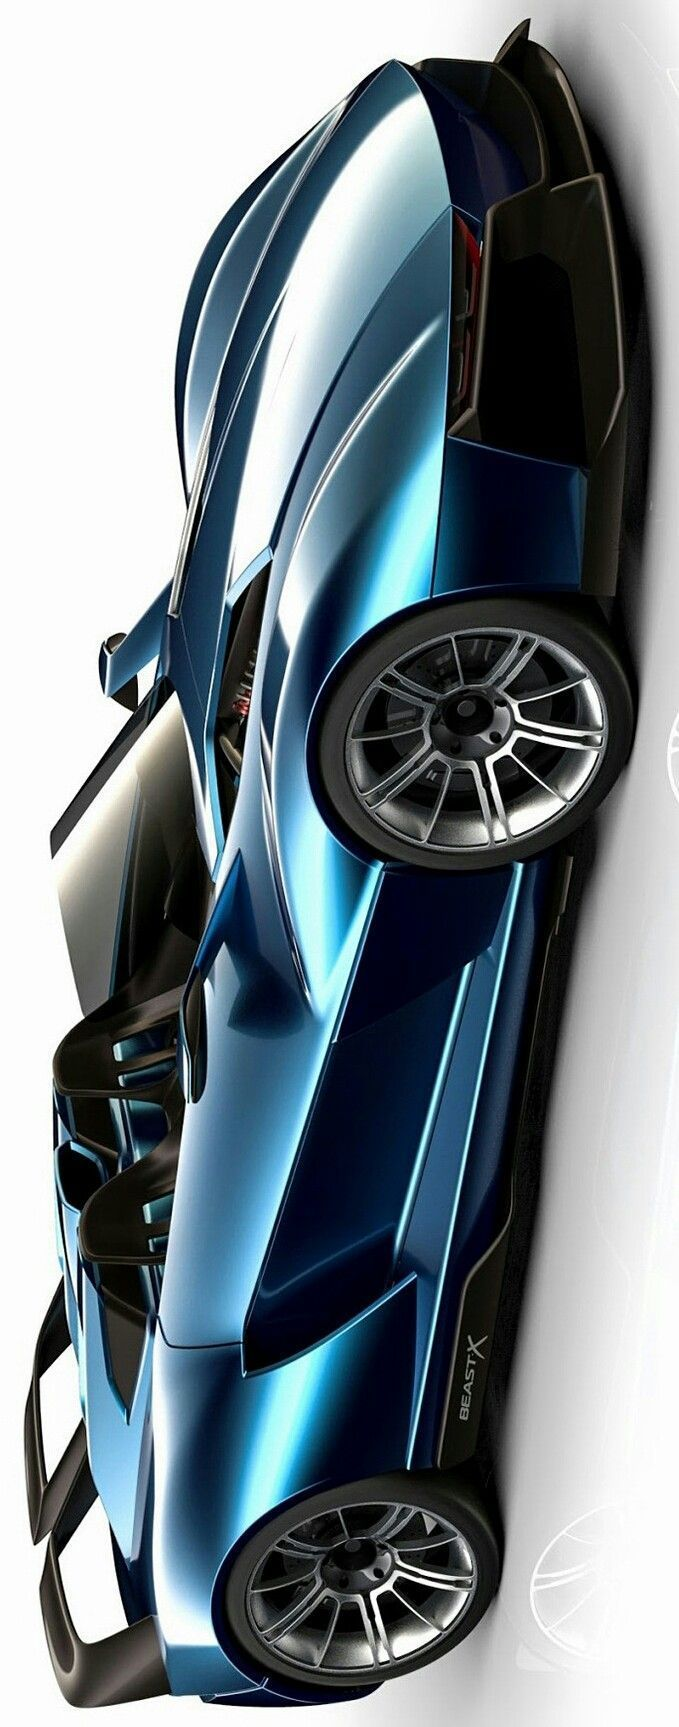 2016 Rezvani Beast X by Levon #hypercar #supercars